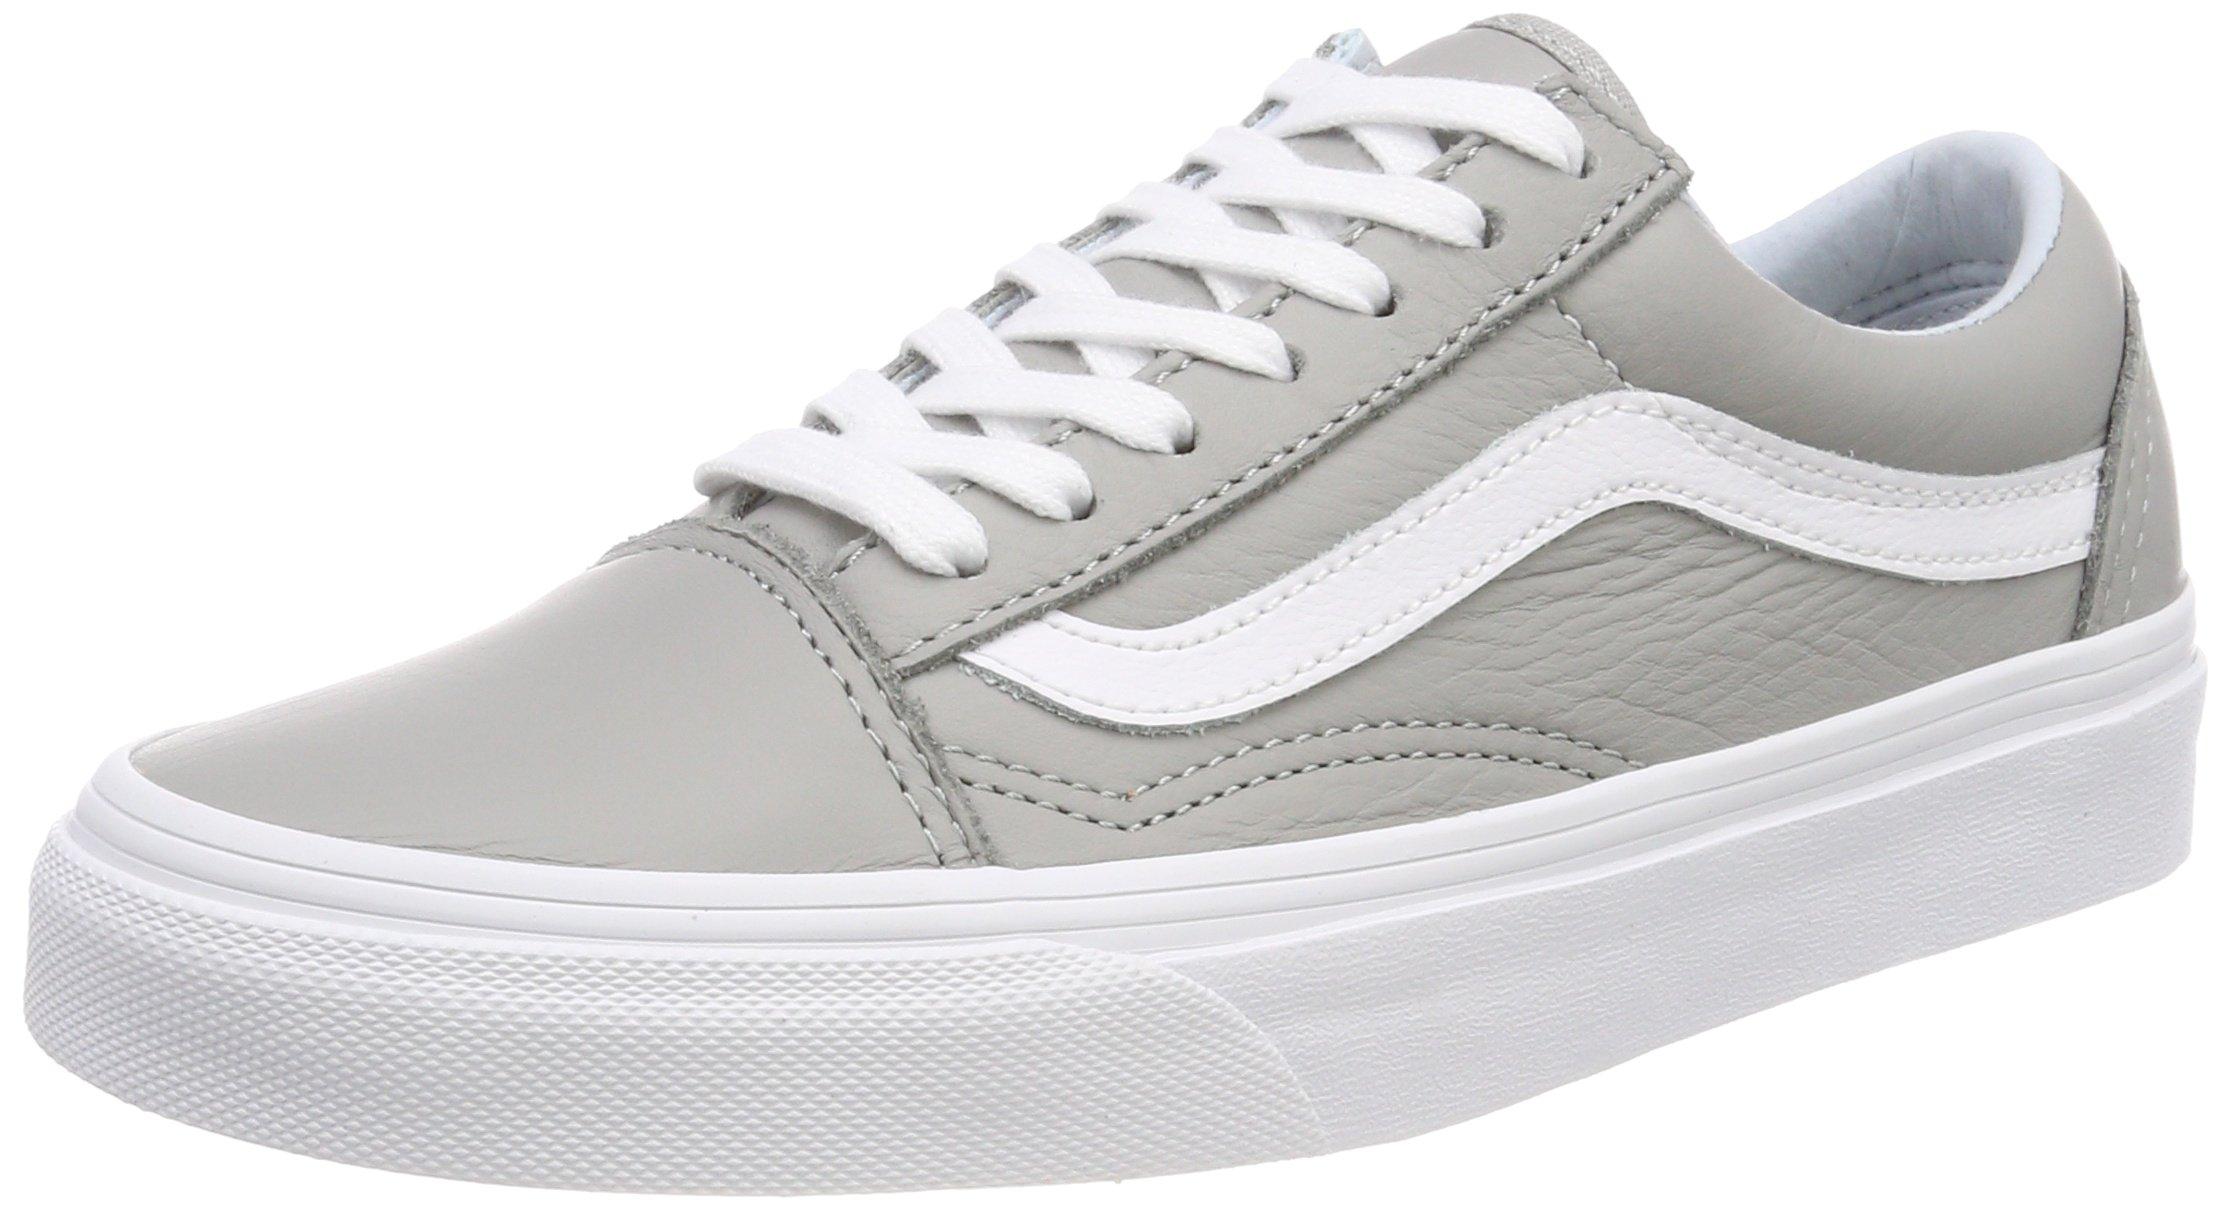 8c3326c3ee288 Vans Unisex Adults' Old Skool Trainers, Grey ((Leather) Oxford/Drizzle  Qd5), 11 UK 46 EU